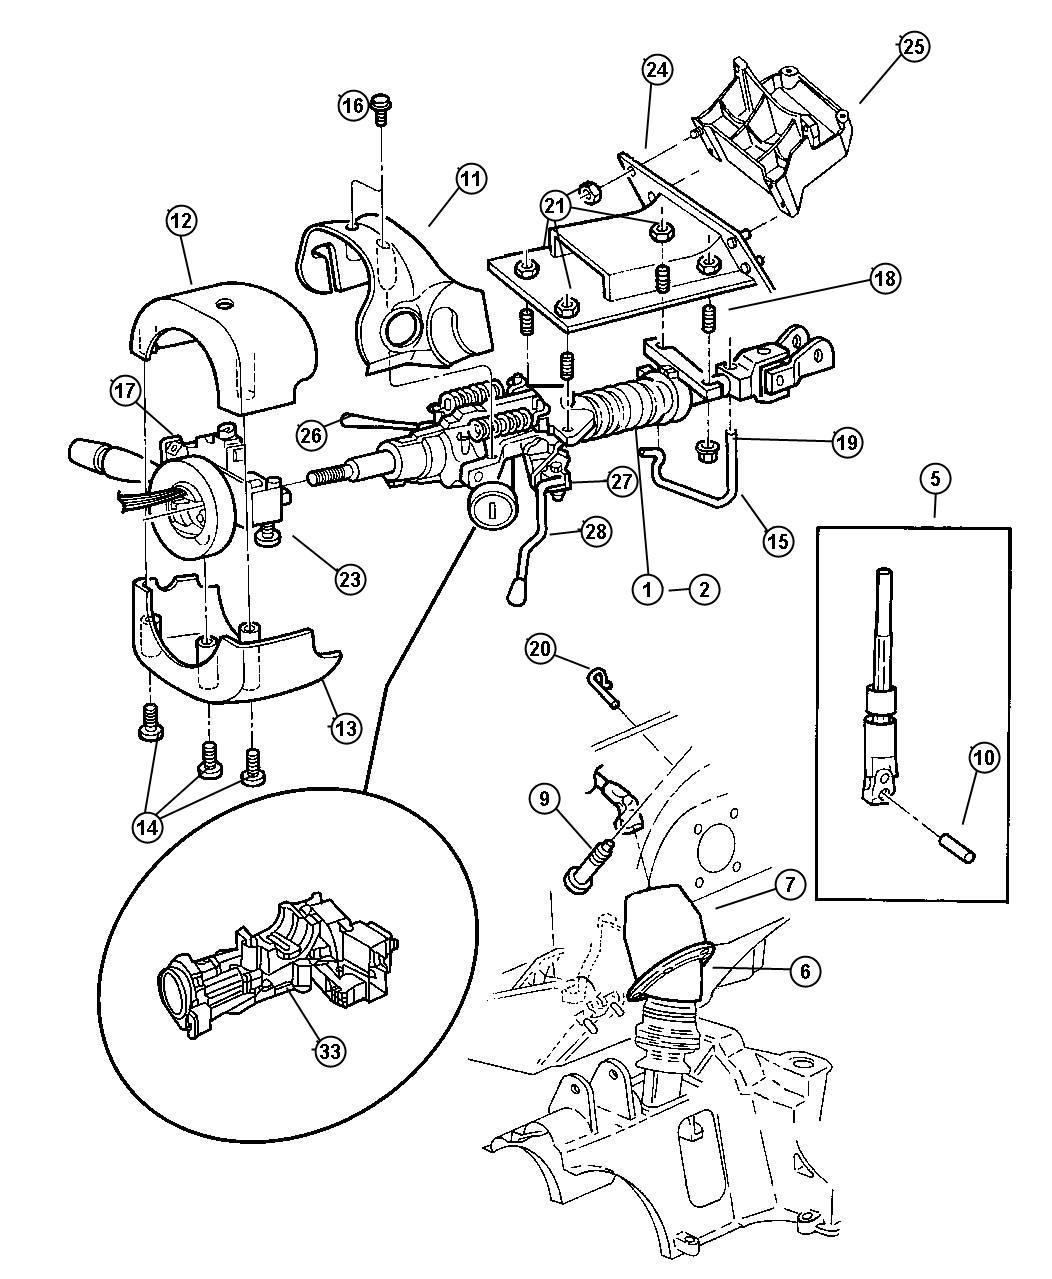 Diagram Jeep Wrangler Steering Column Diagram Full